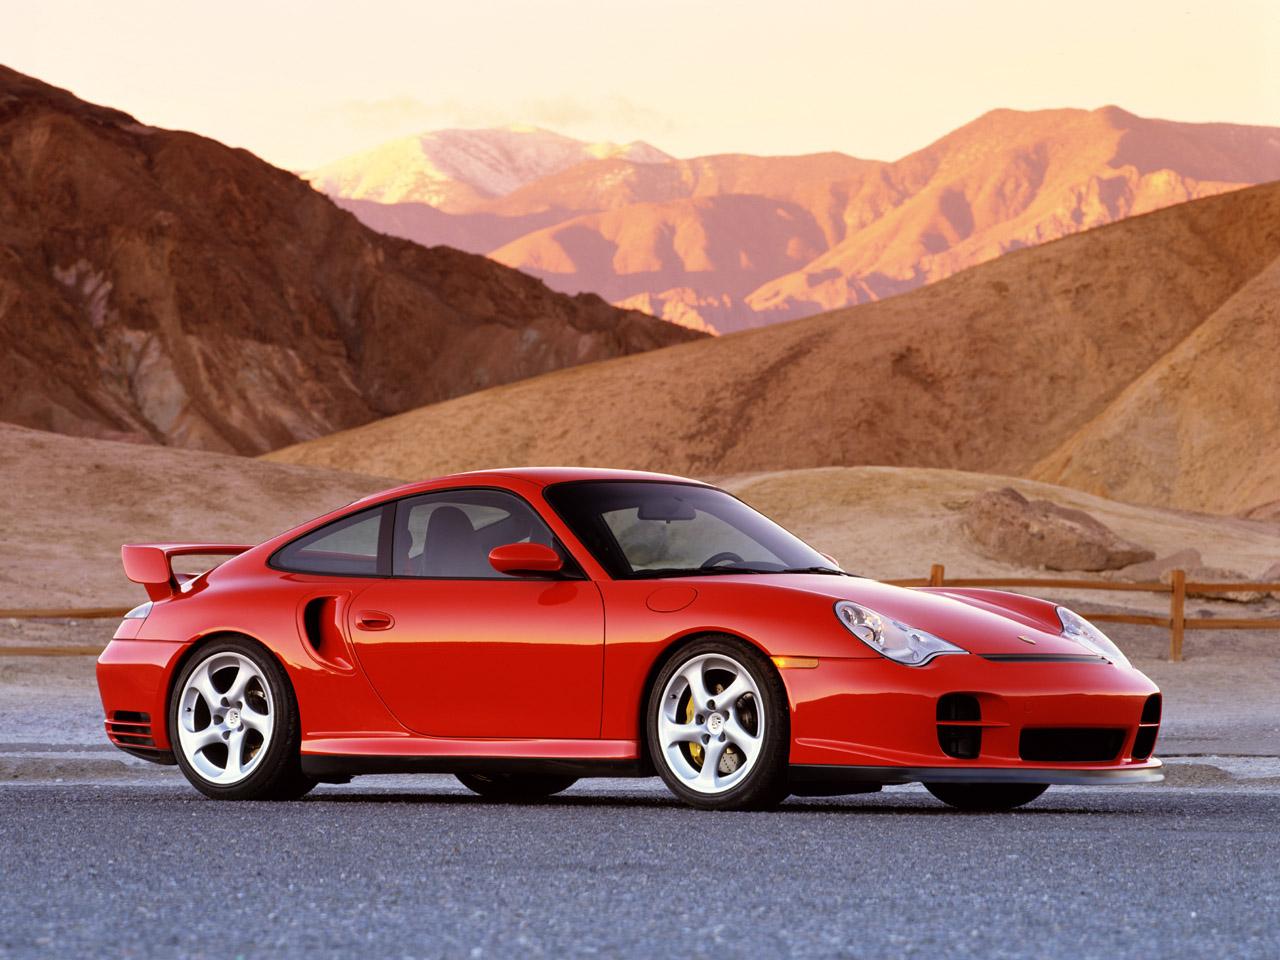 Aston Martin Db9 Hd Wallpaper Red Porsche Car Cars Gallery